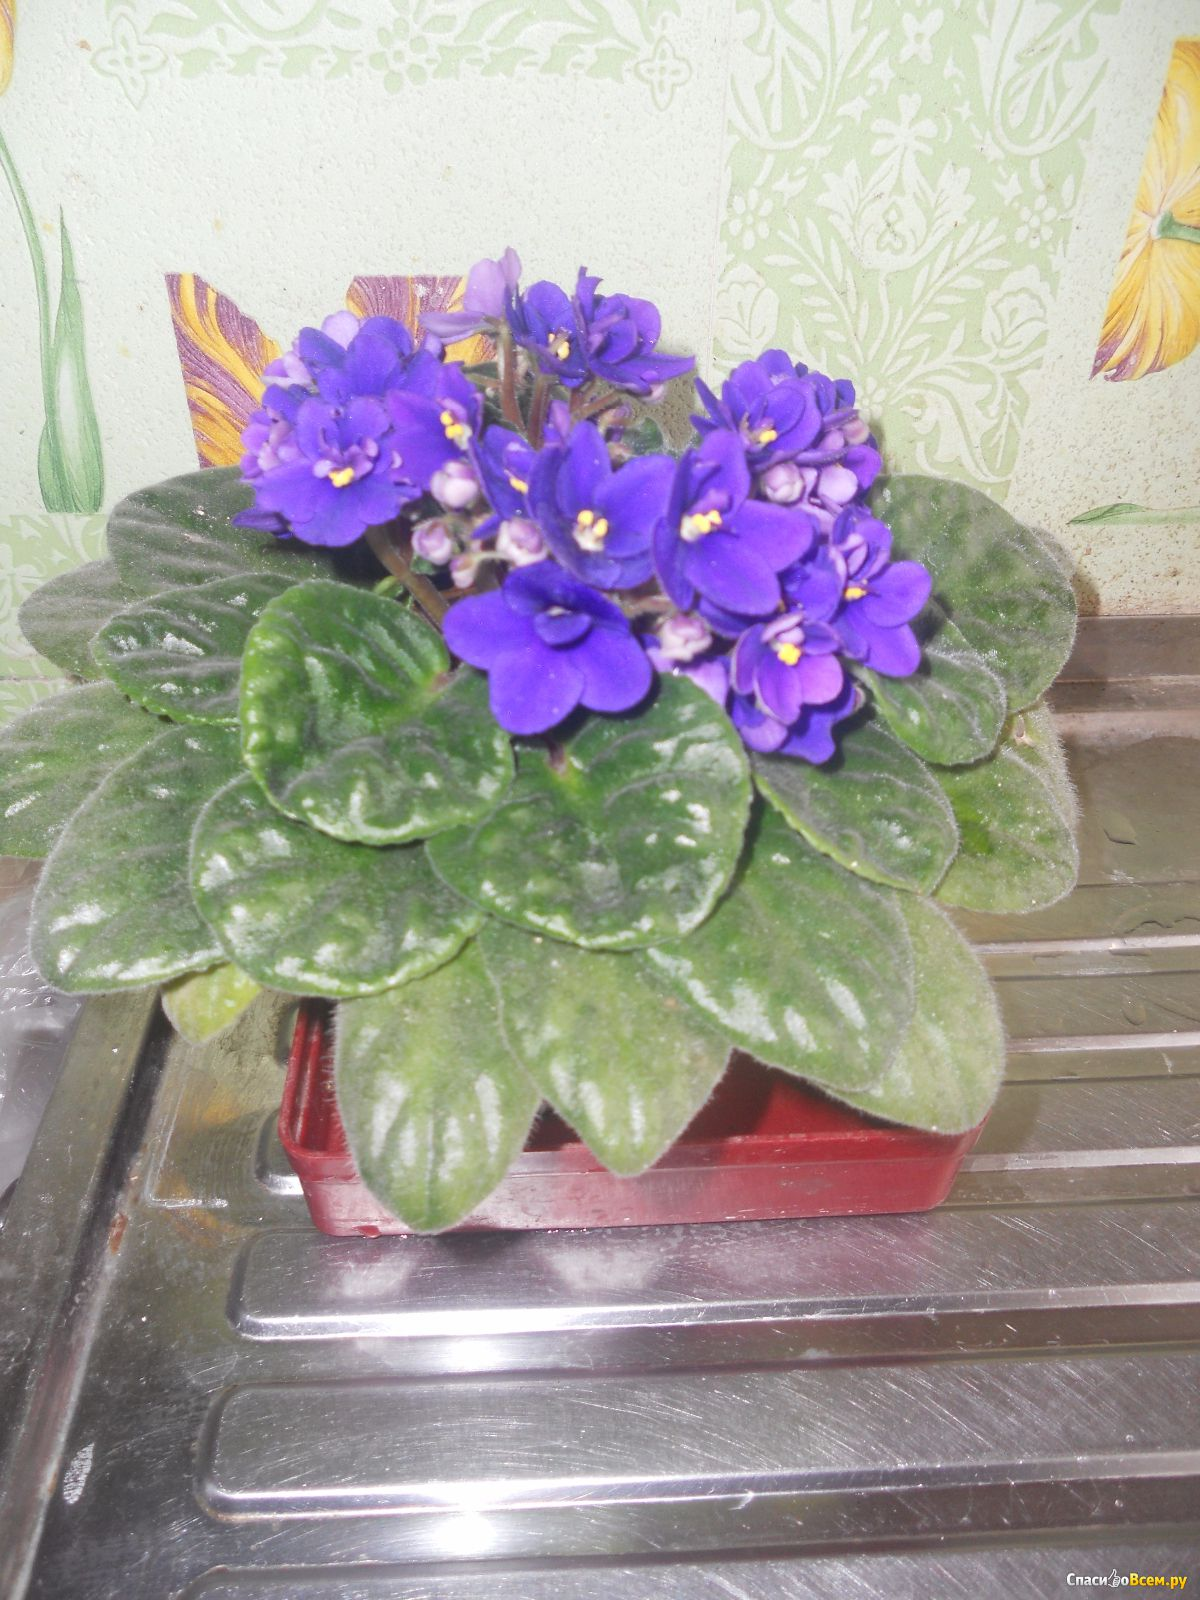 Фото комнатного цветка похожего на фиалку